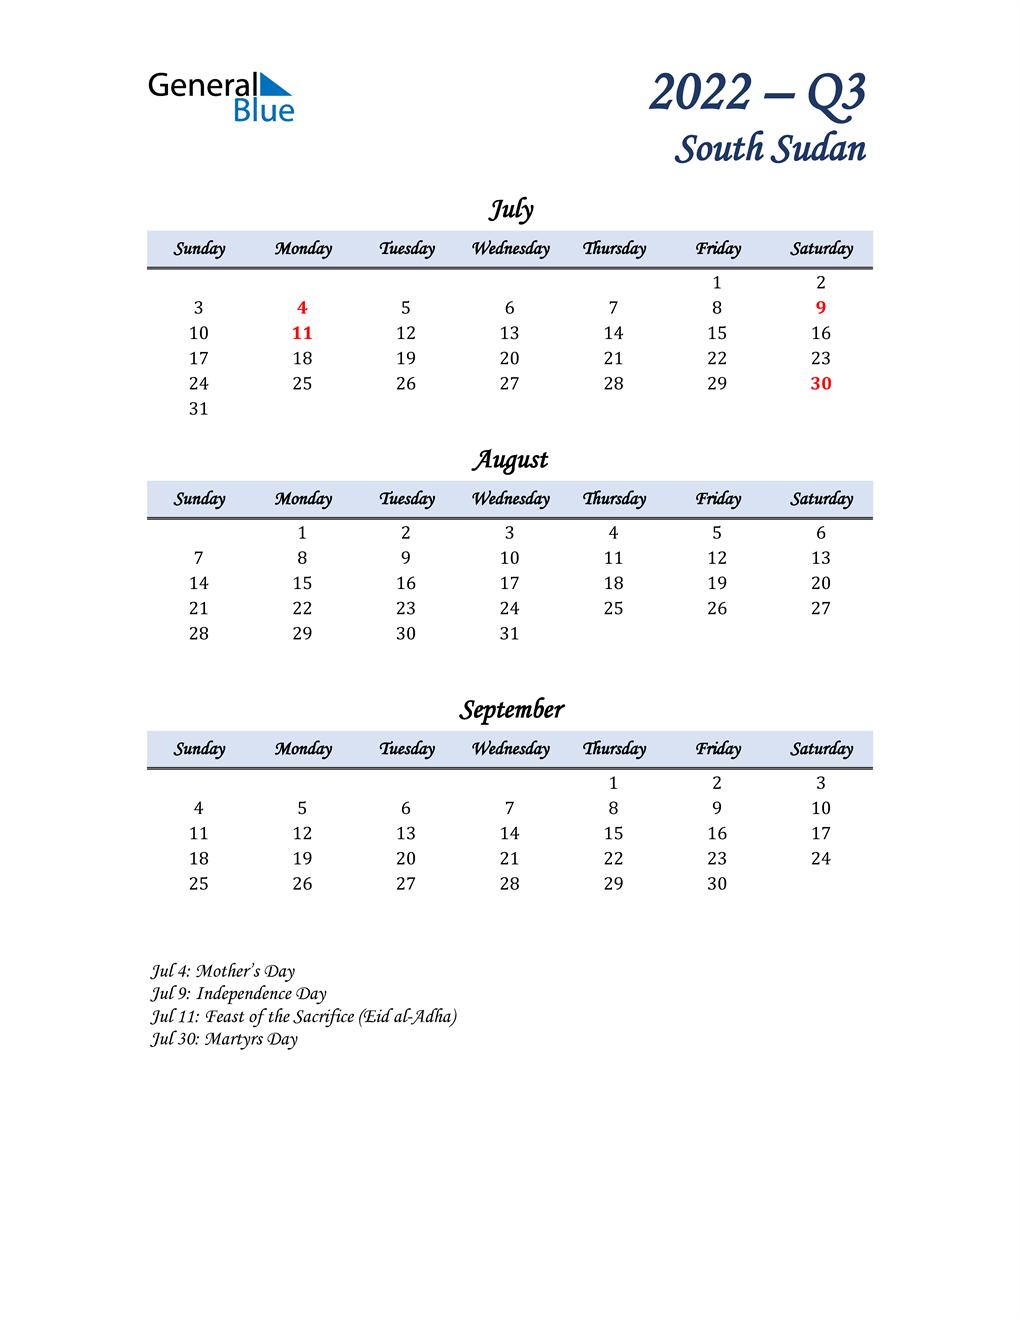 July, August, and September Calendar for South Sudan